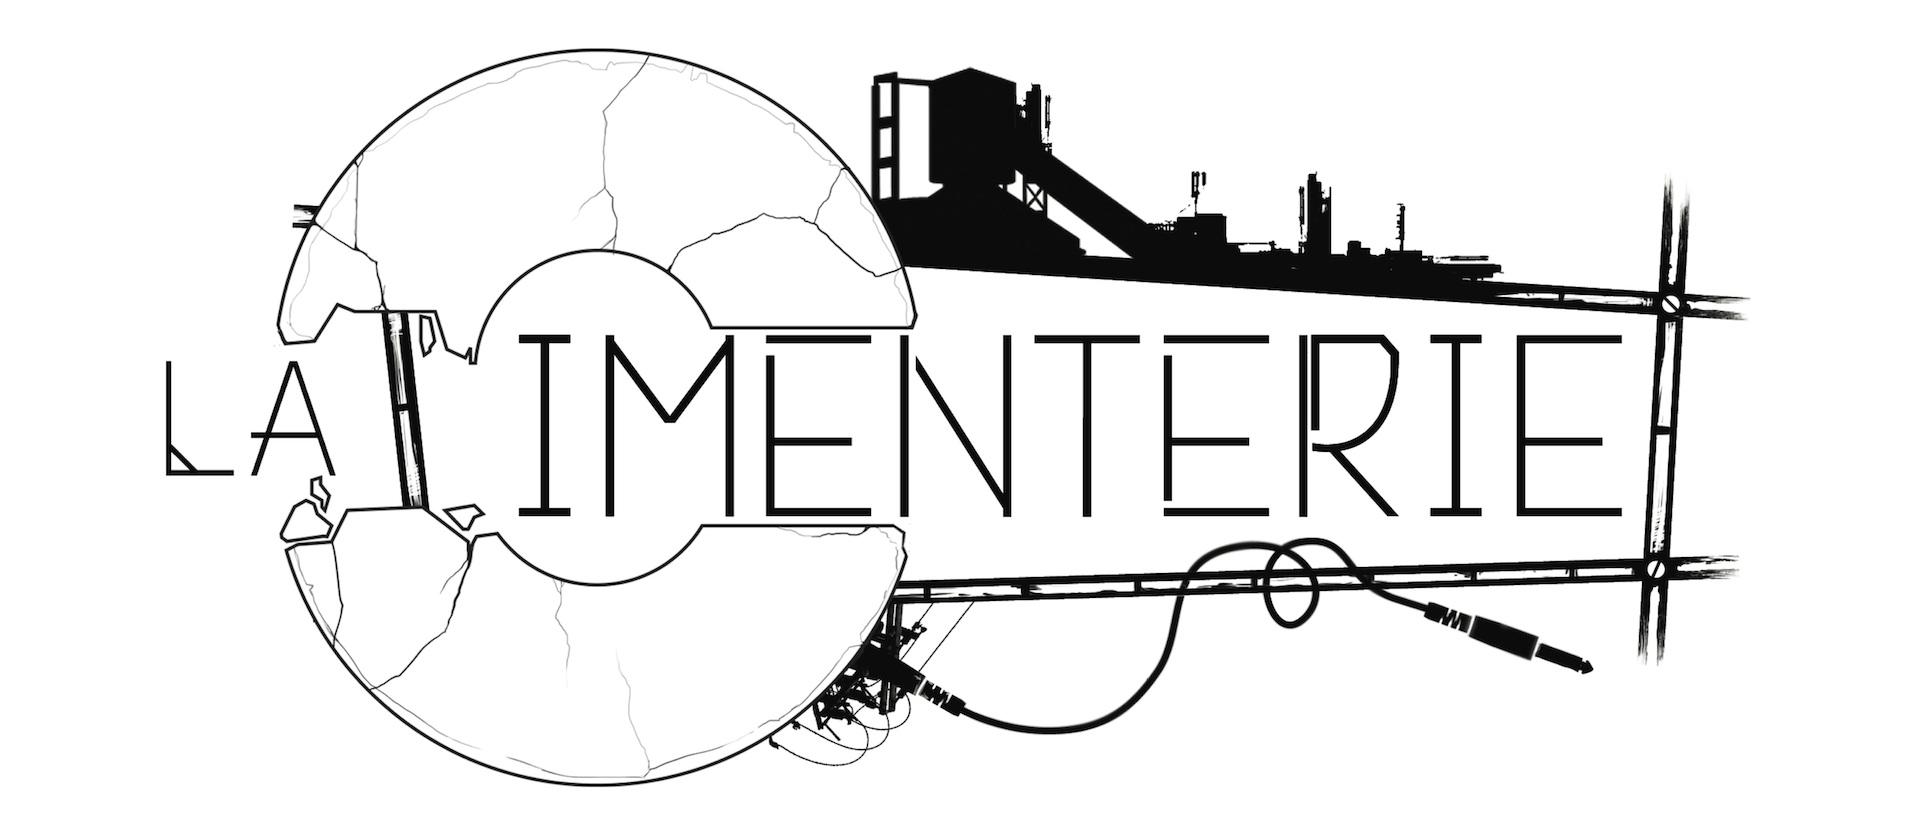 La cimenterie logo